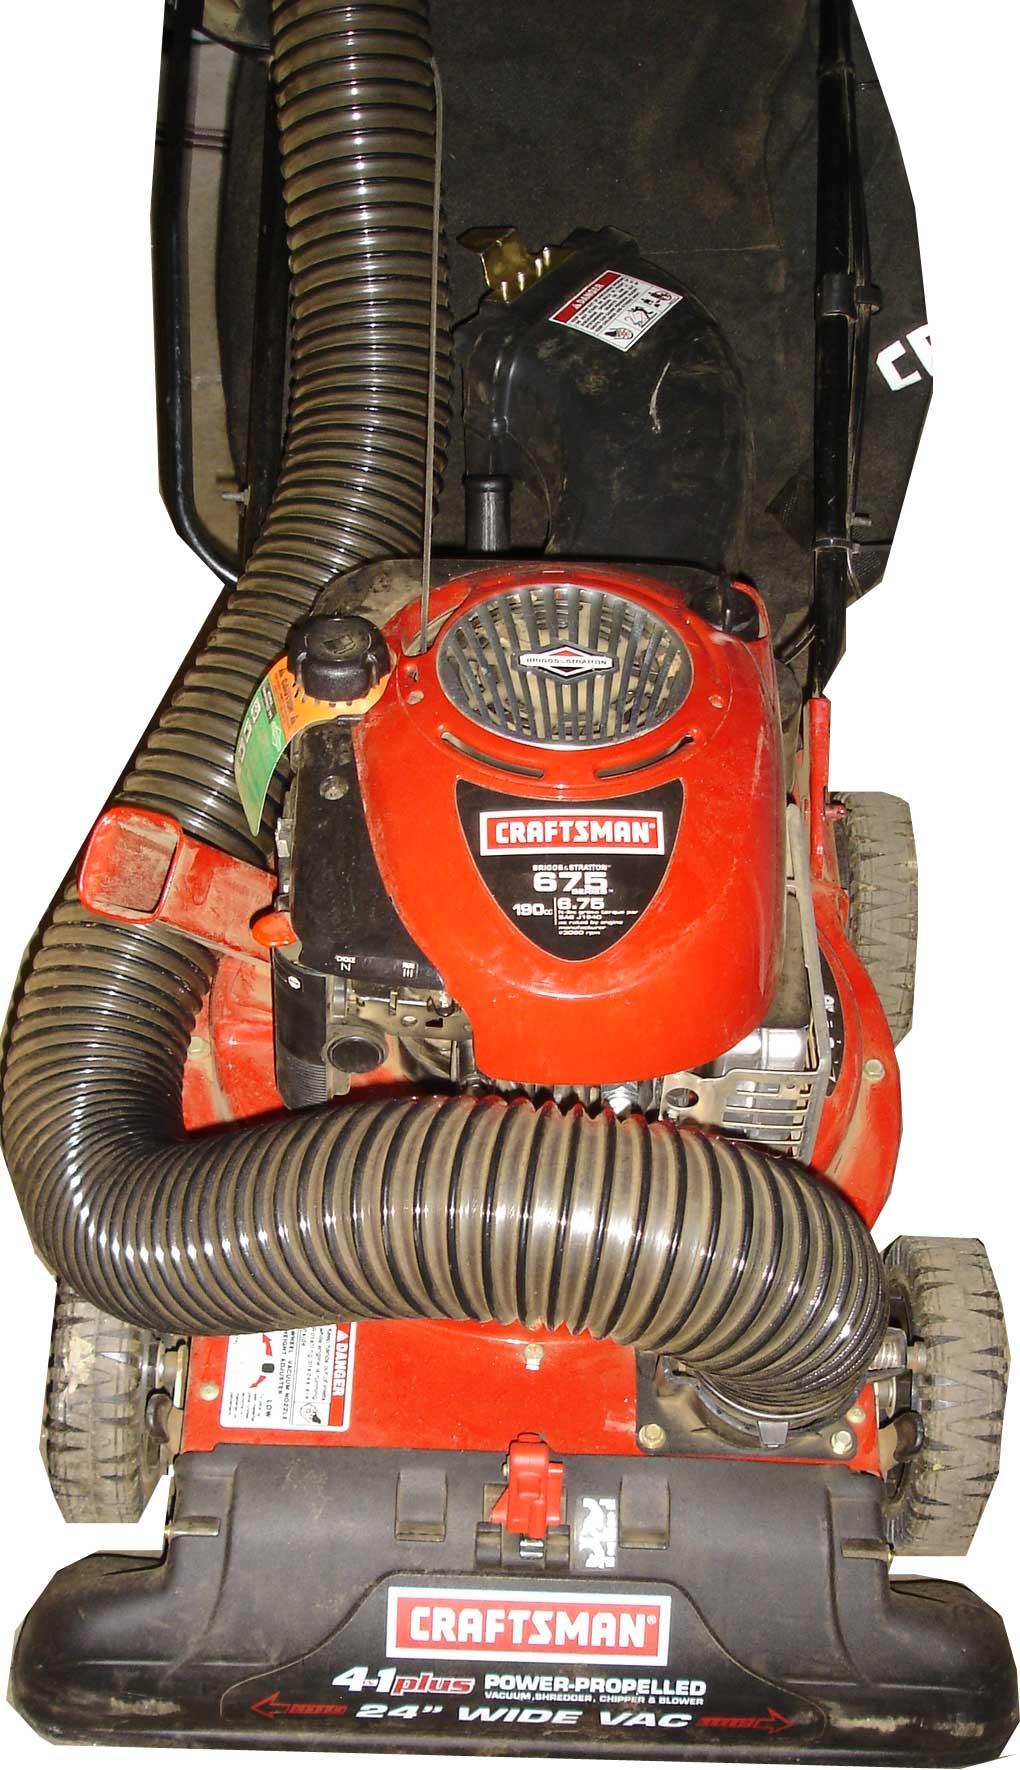 Sears Craftsman Lawn Vacuum And Chipper : Craftsman in yard vacuum blower chipper system ebay